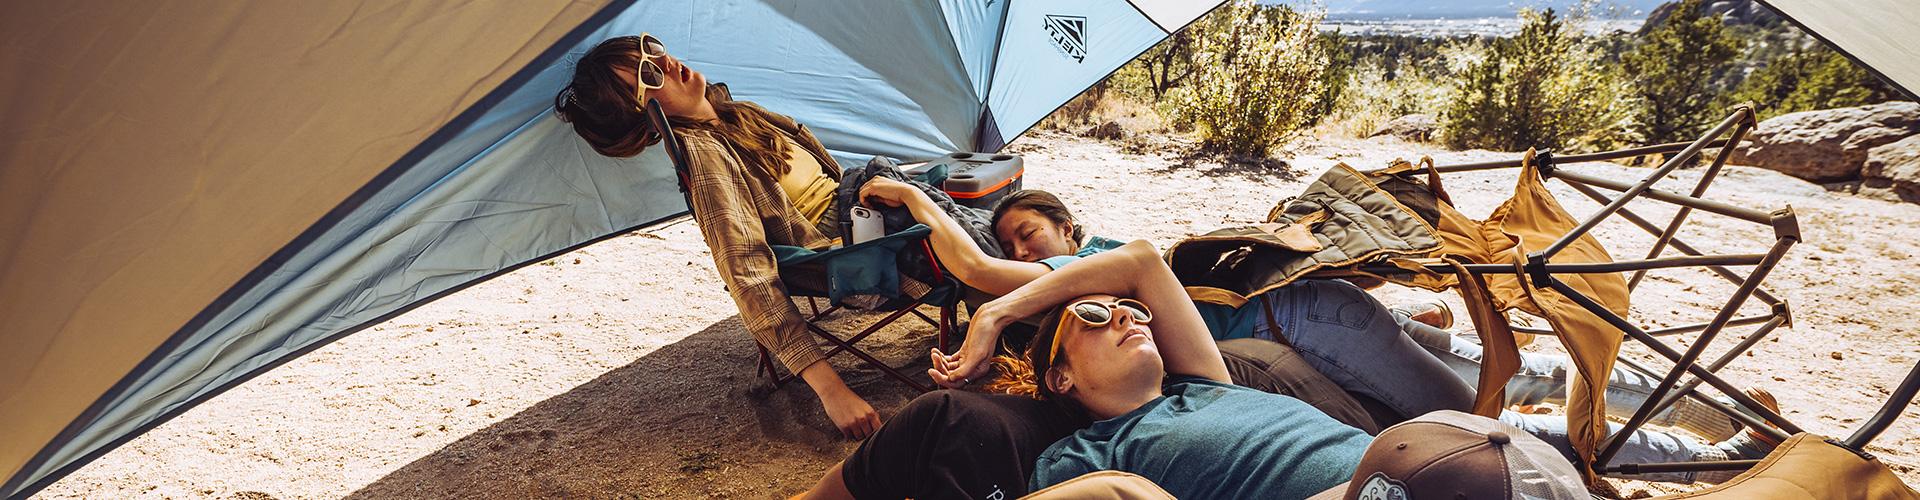 Woman sleeping under a Kelty sun shelter